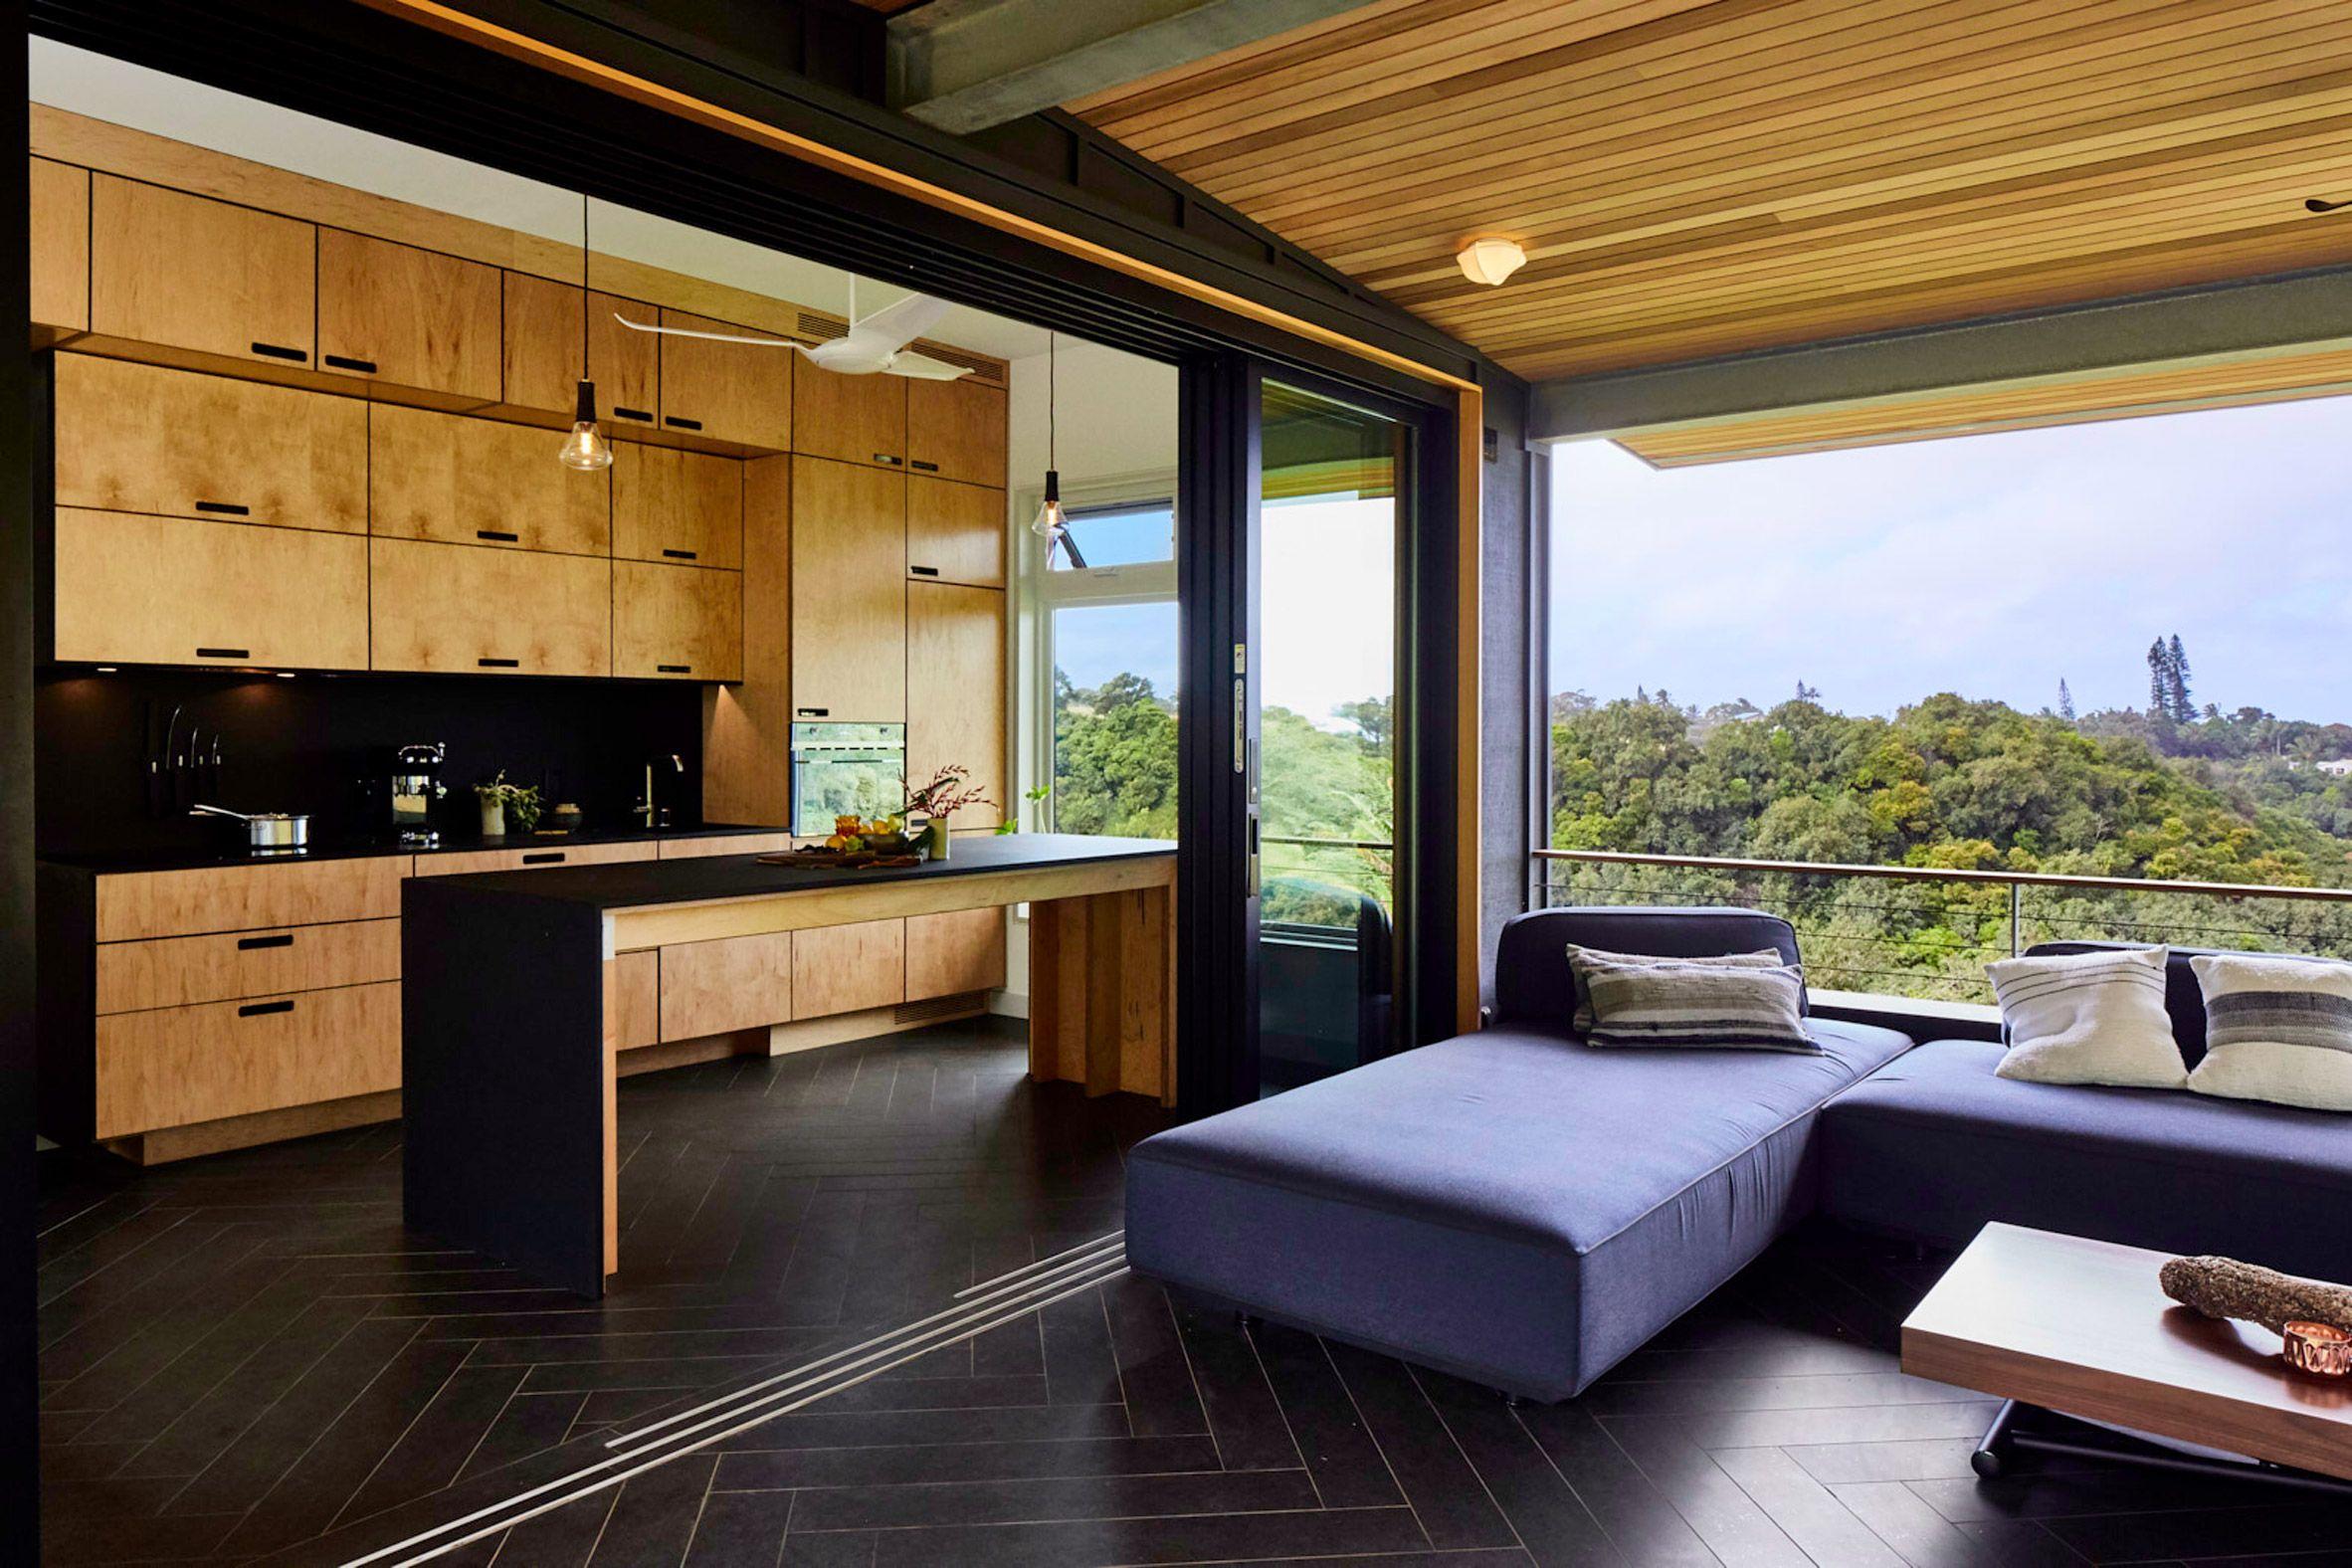 Maui House By Lifeedited The Two Storey House Sits On A Steep